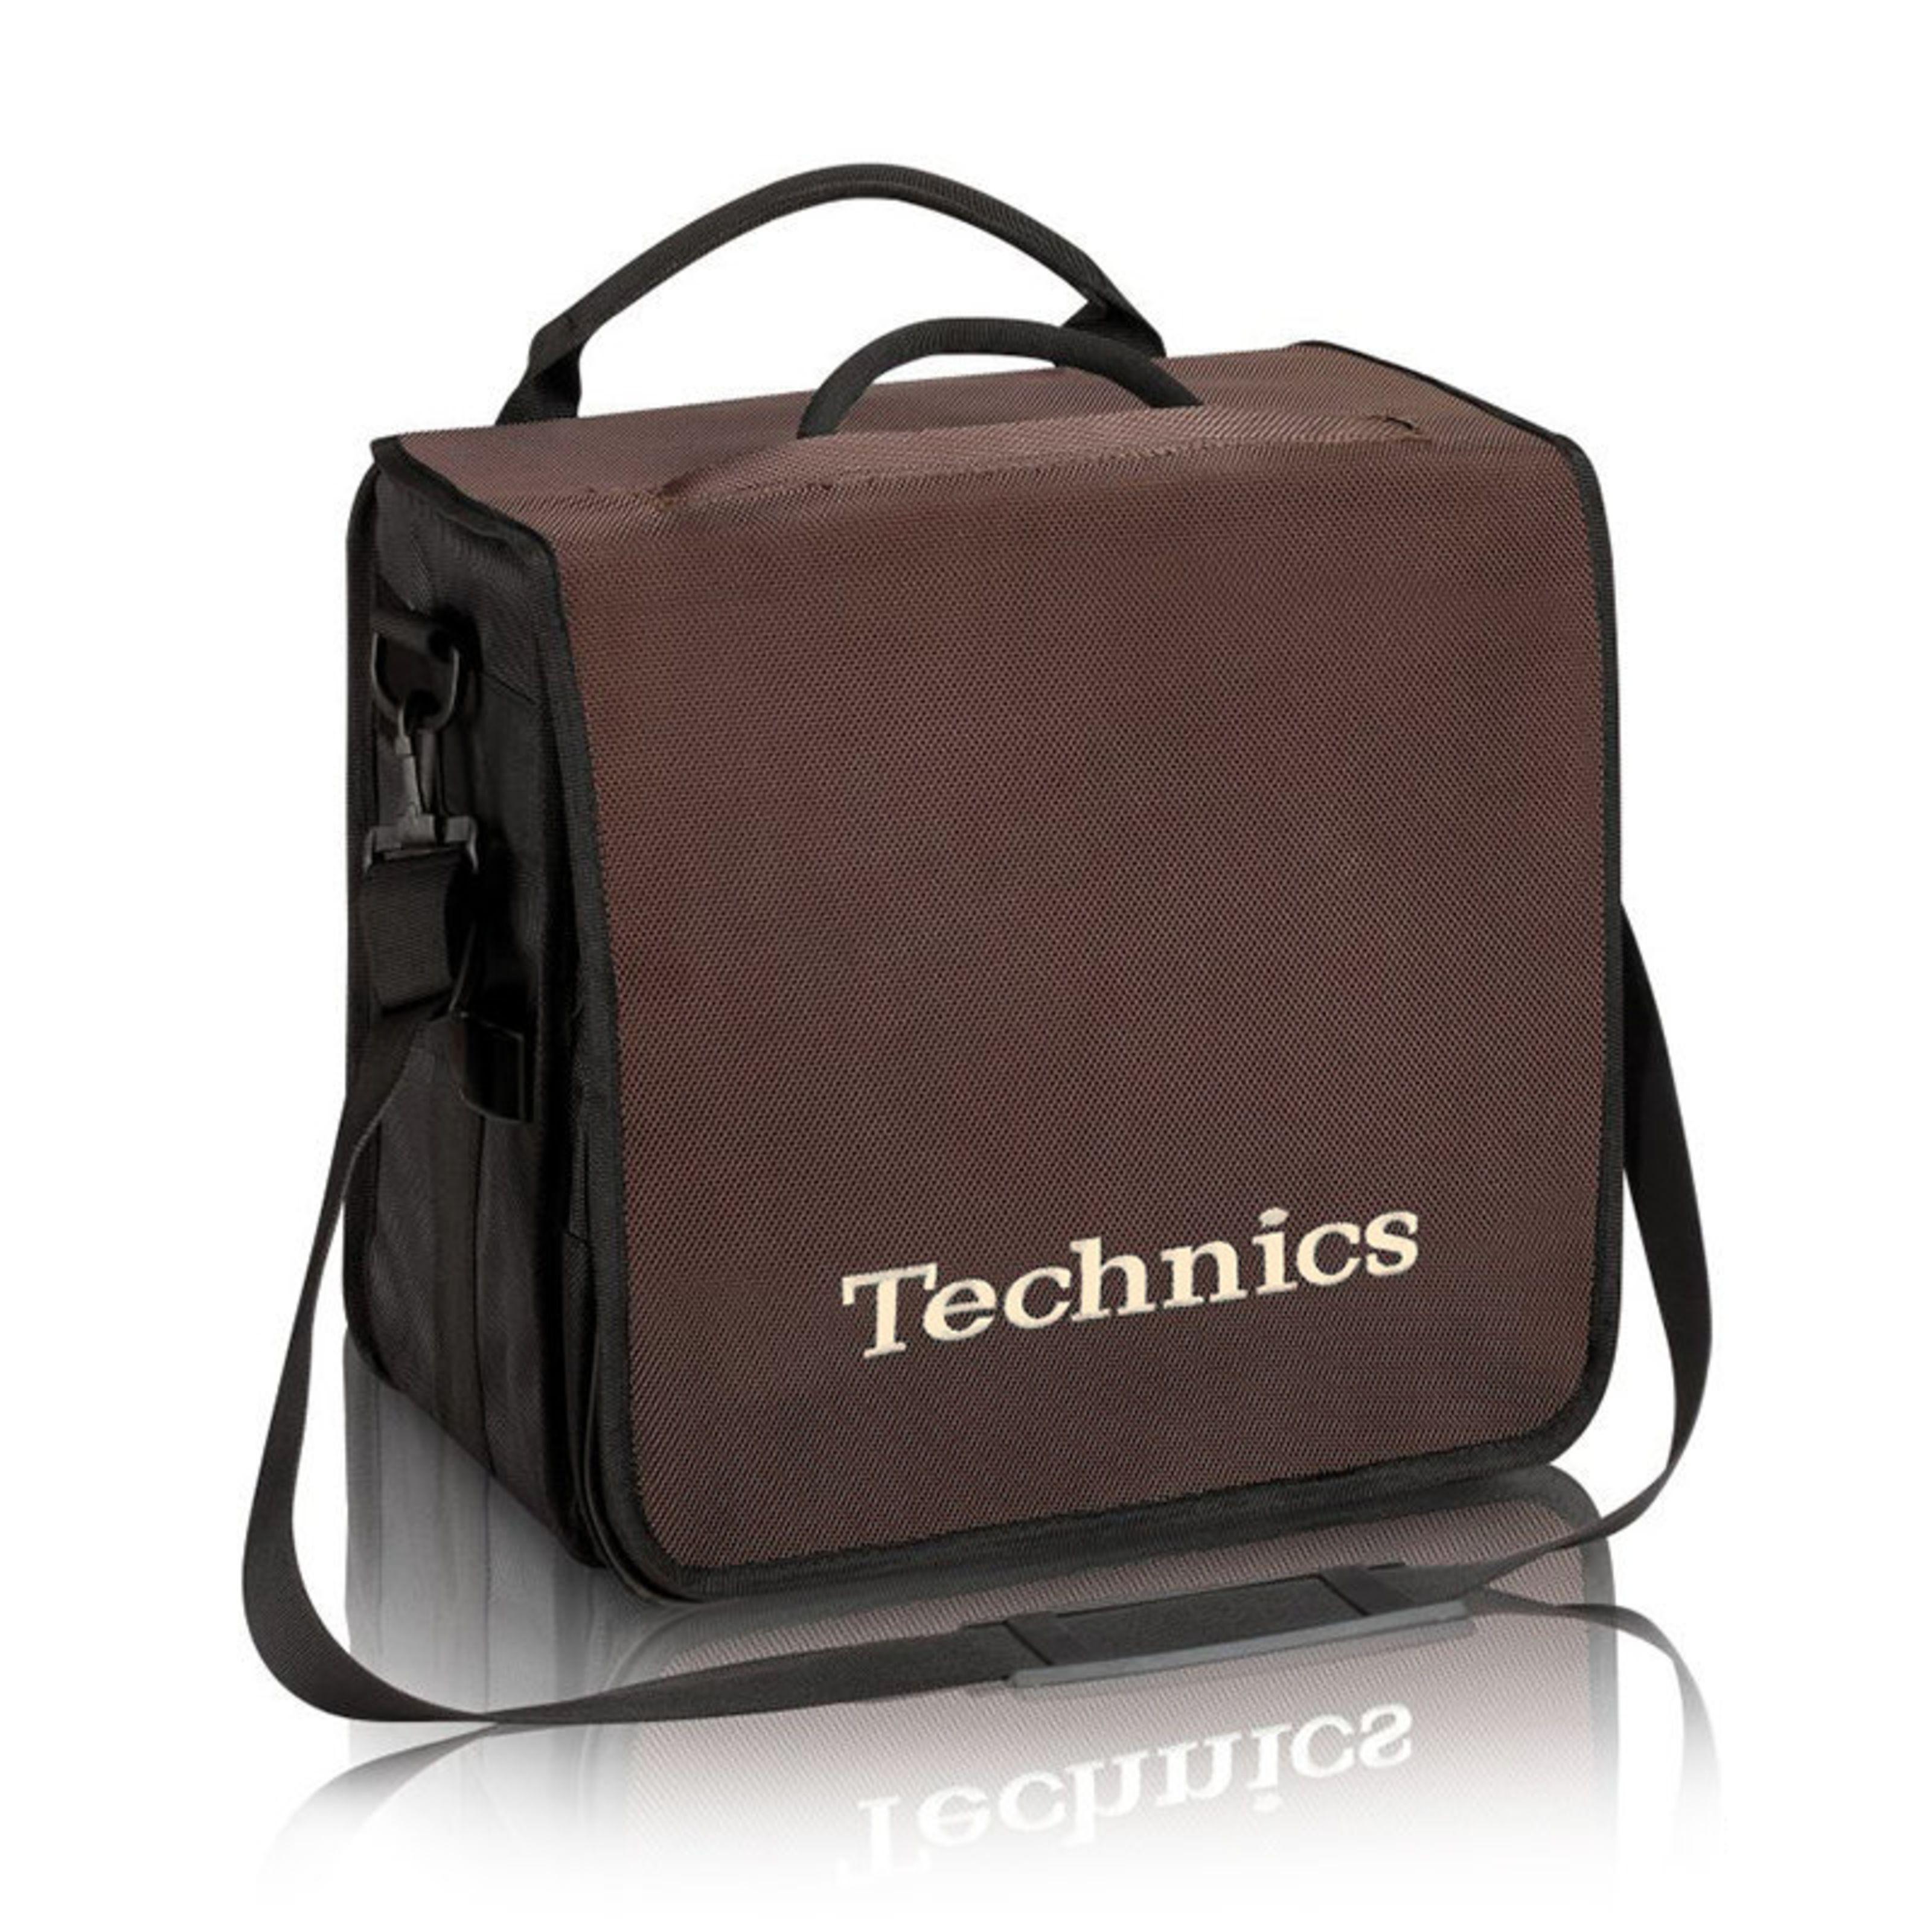 Technics BackBag marrón-beige